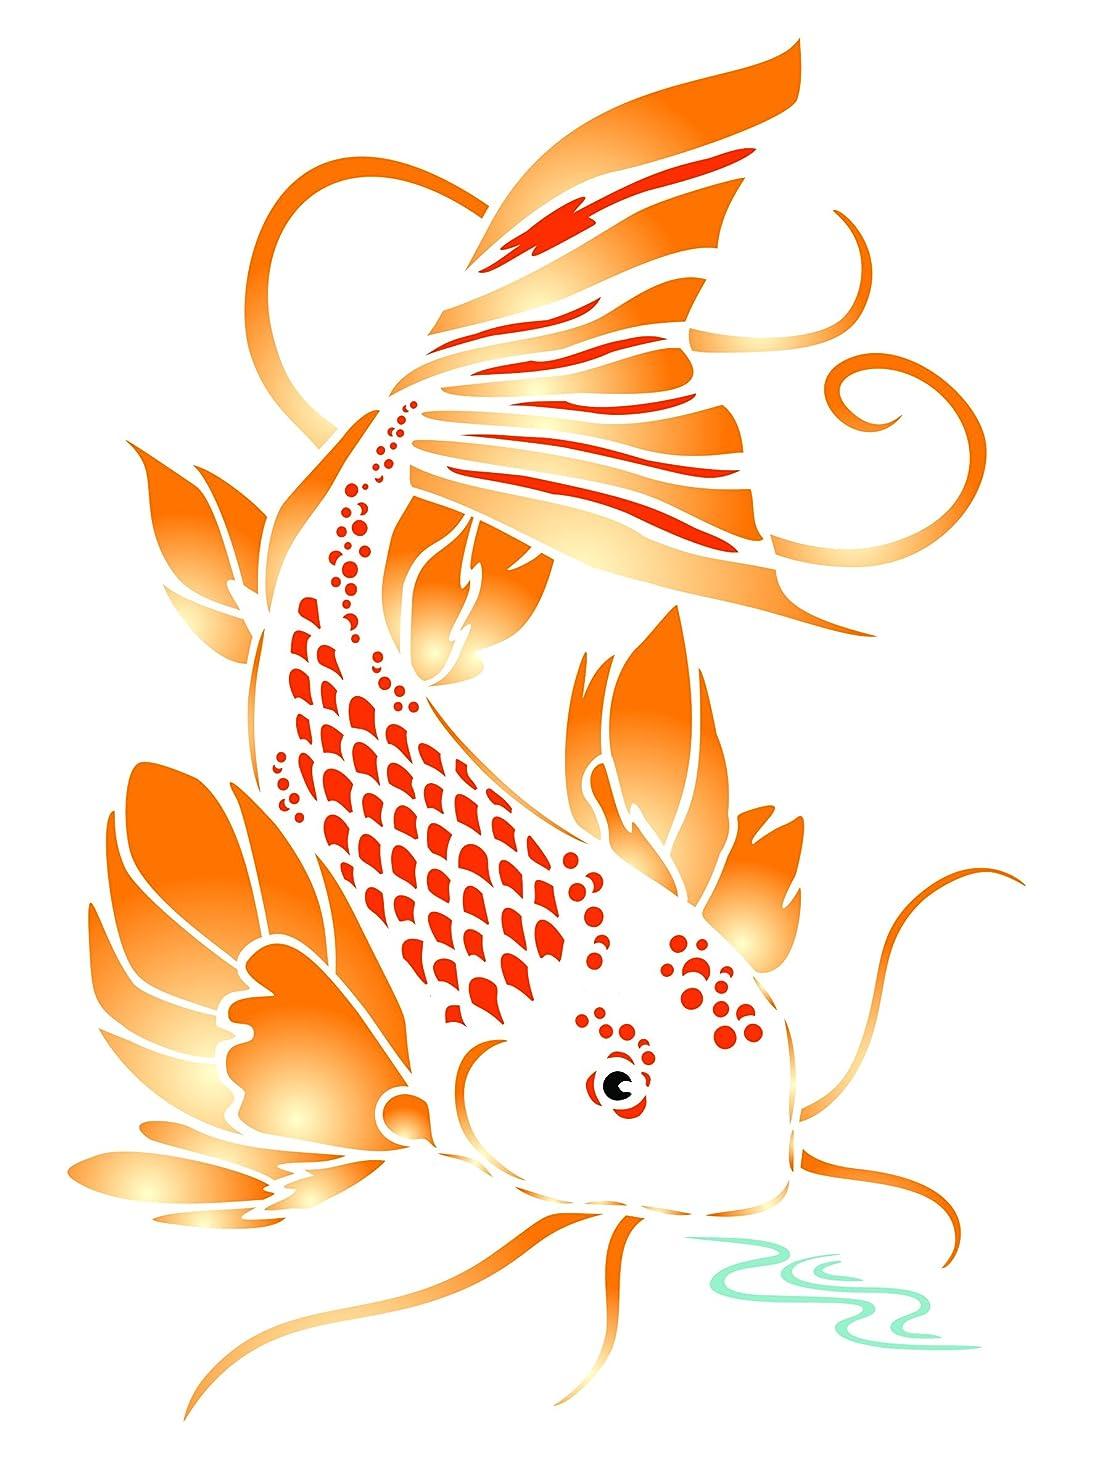 Koi Stencil - 8 x 11.5 inch (L) - Reusable Asian Oriental Carp Fish Animal Pond Wall Stencil Template - Use on Paper Projects Scrapbook Journal Walls Floors Fabric Furniture Glass Wood etc.